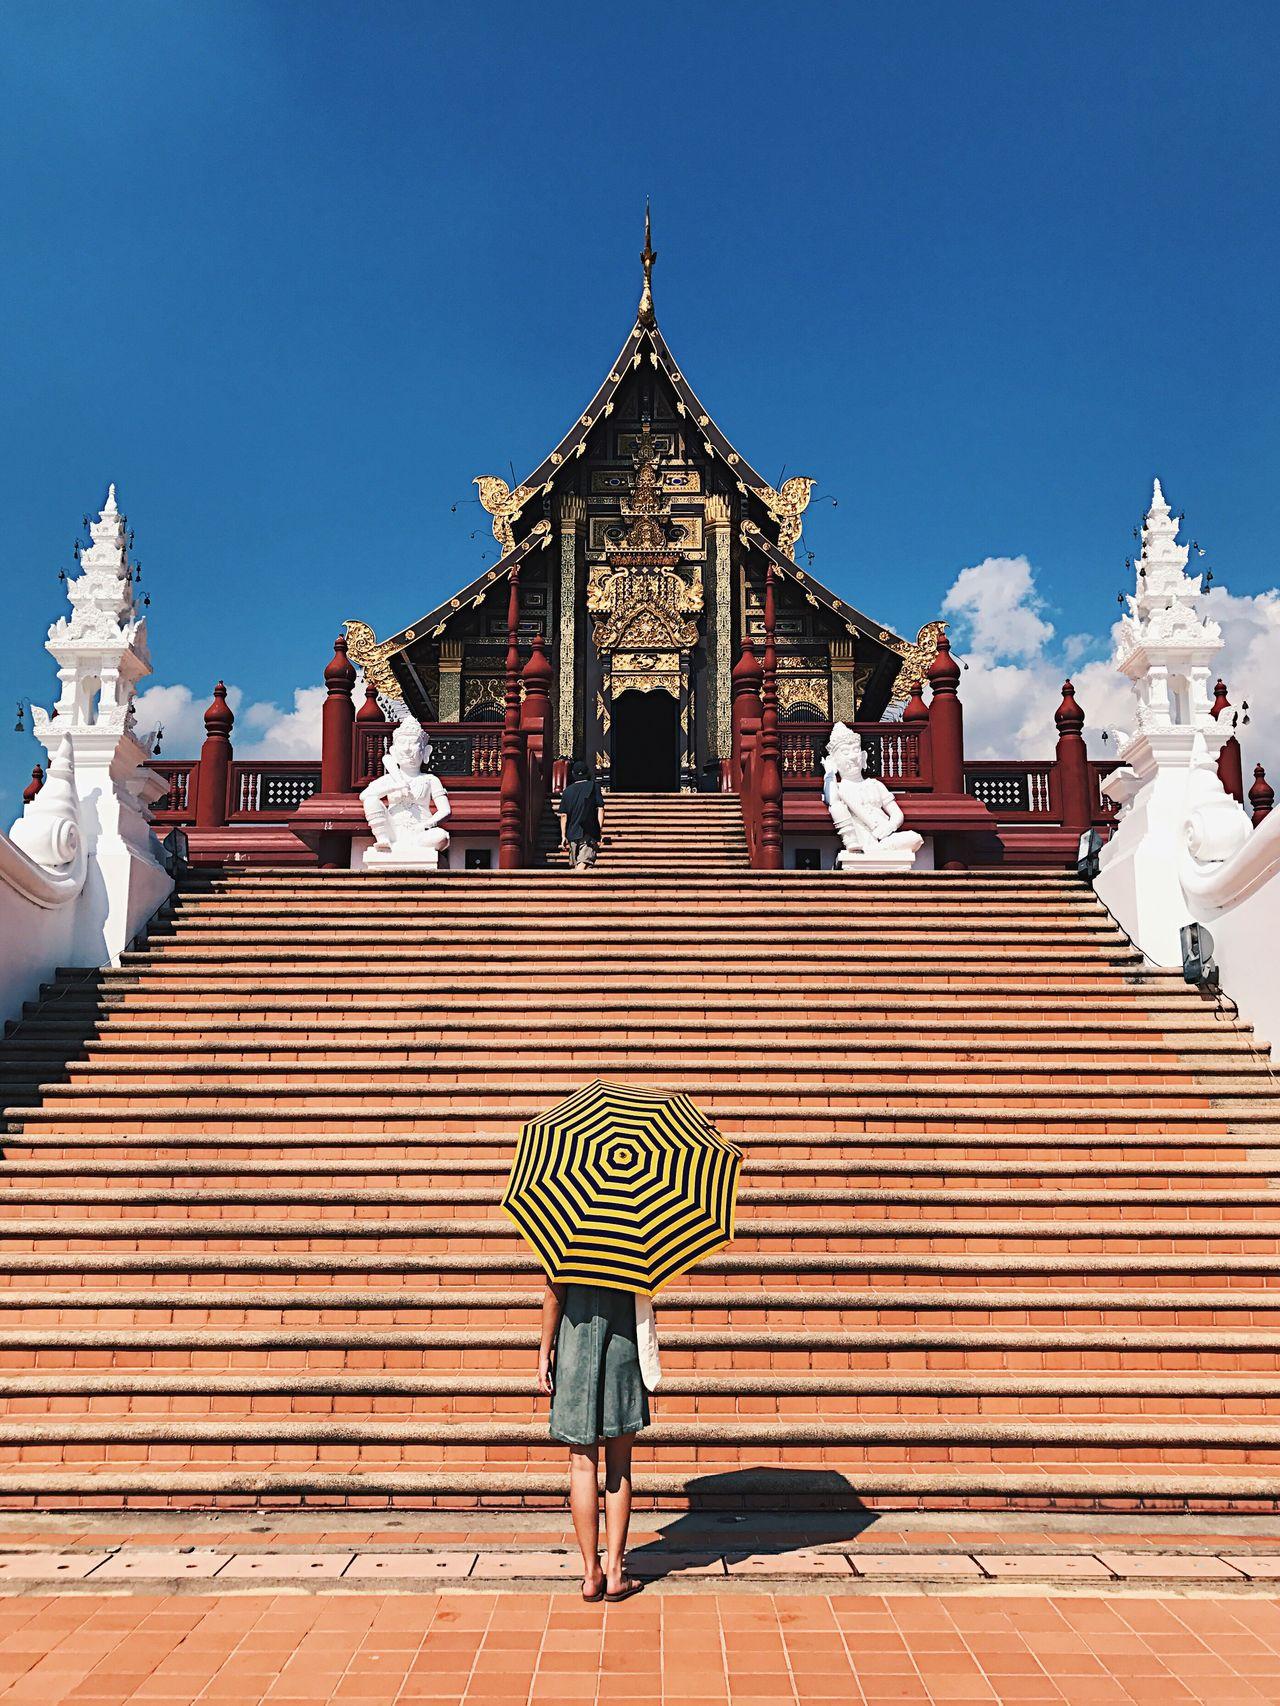 Temple Symmetry Architecture Travel